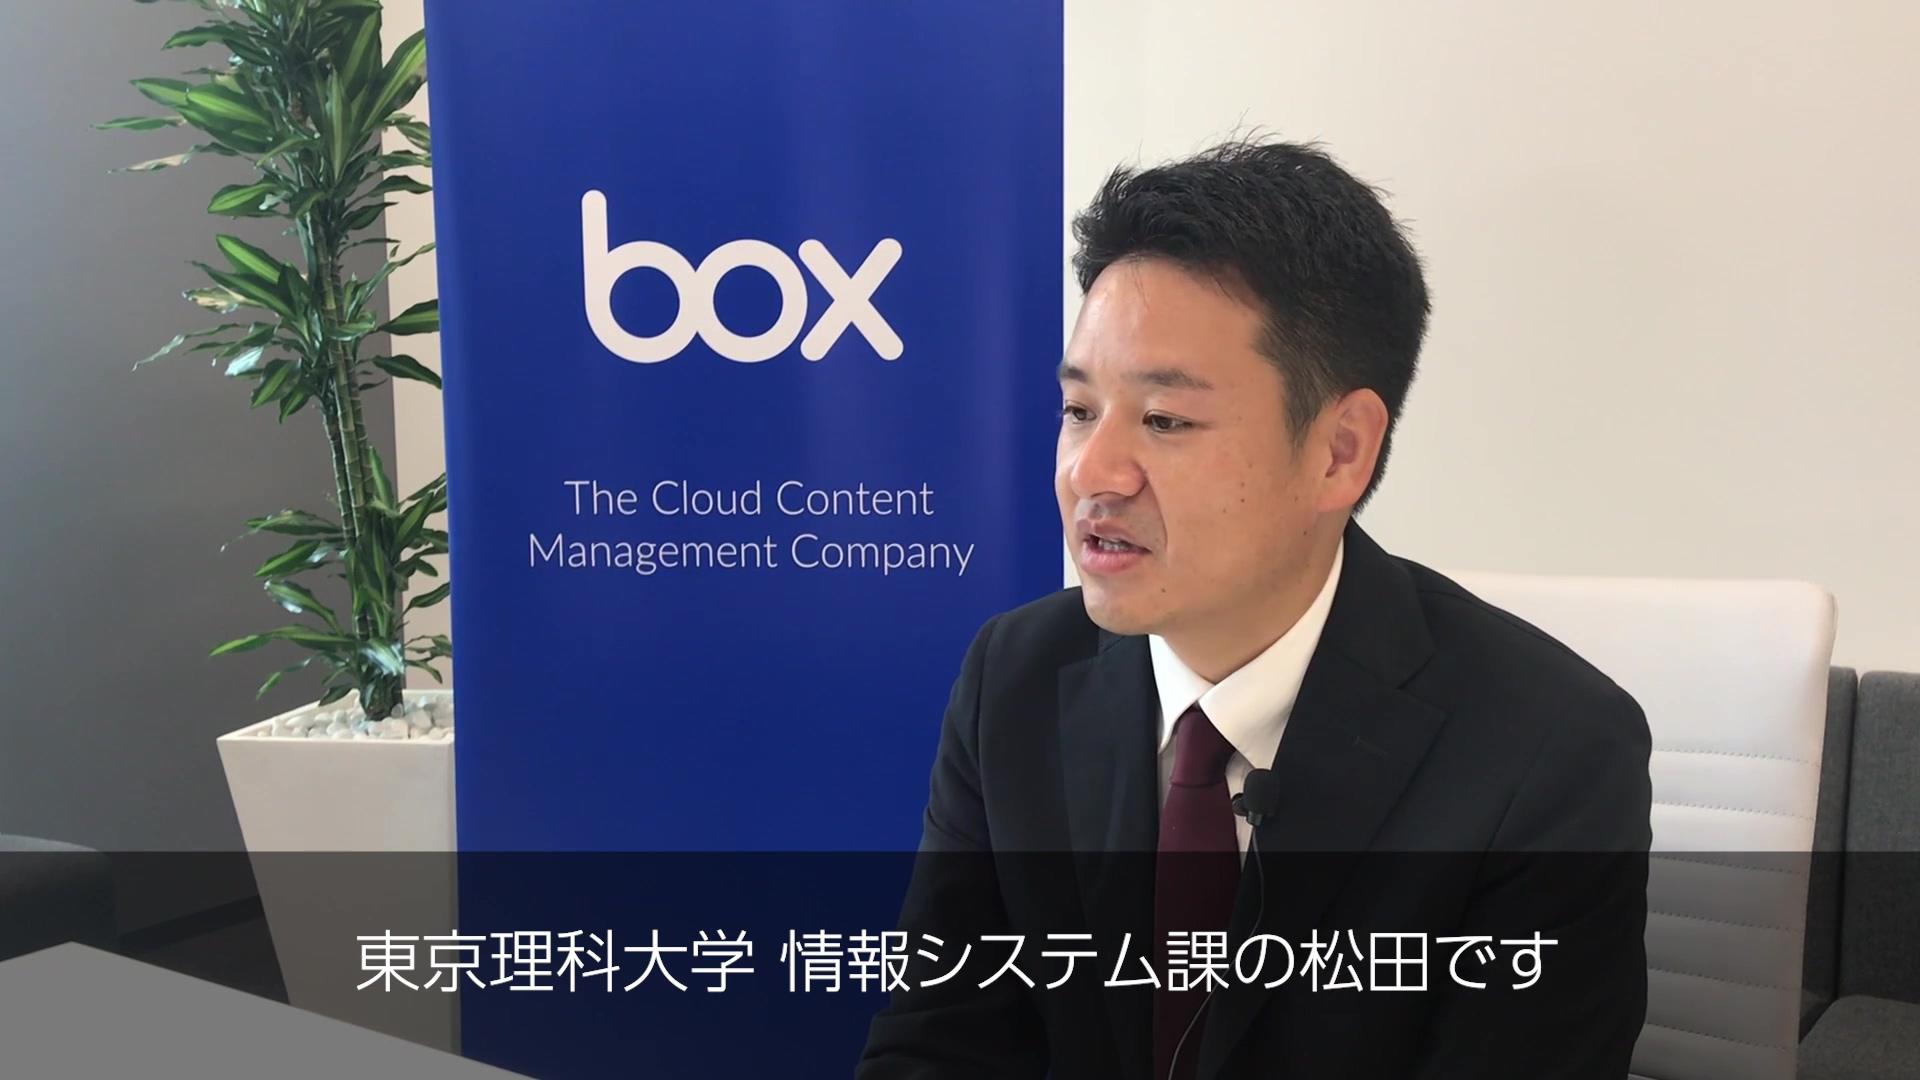 Boxユーザー事例ビデオ:東京理科大学